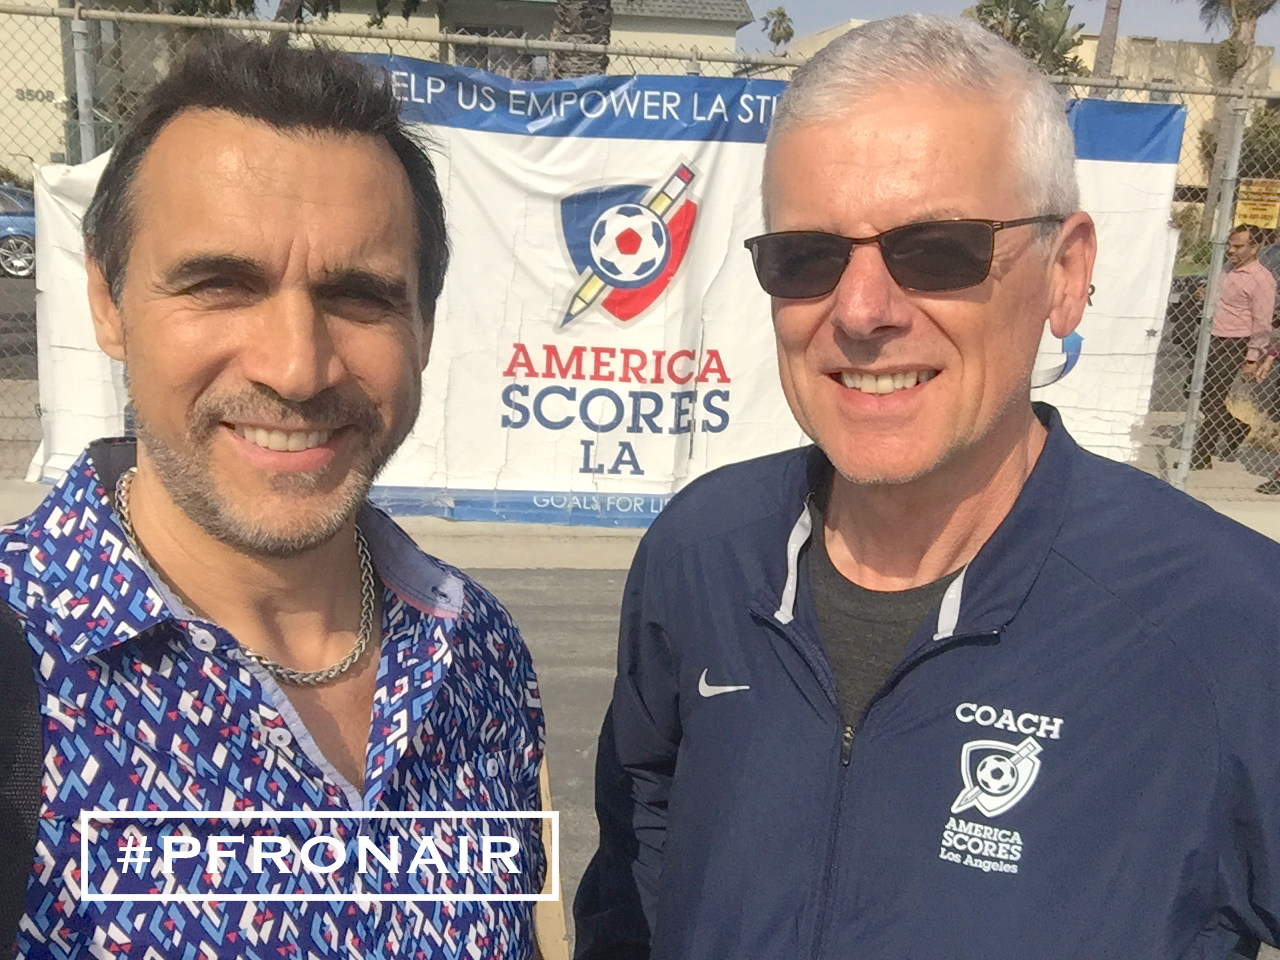 Adrian with Geoff Wilson, Executive Director America Scores LA